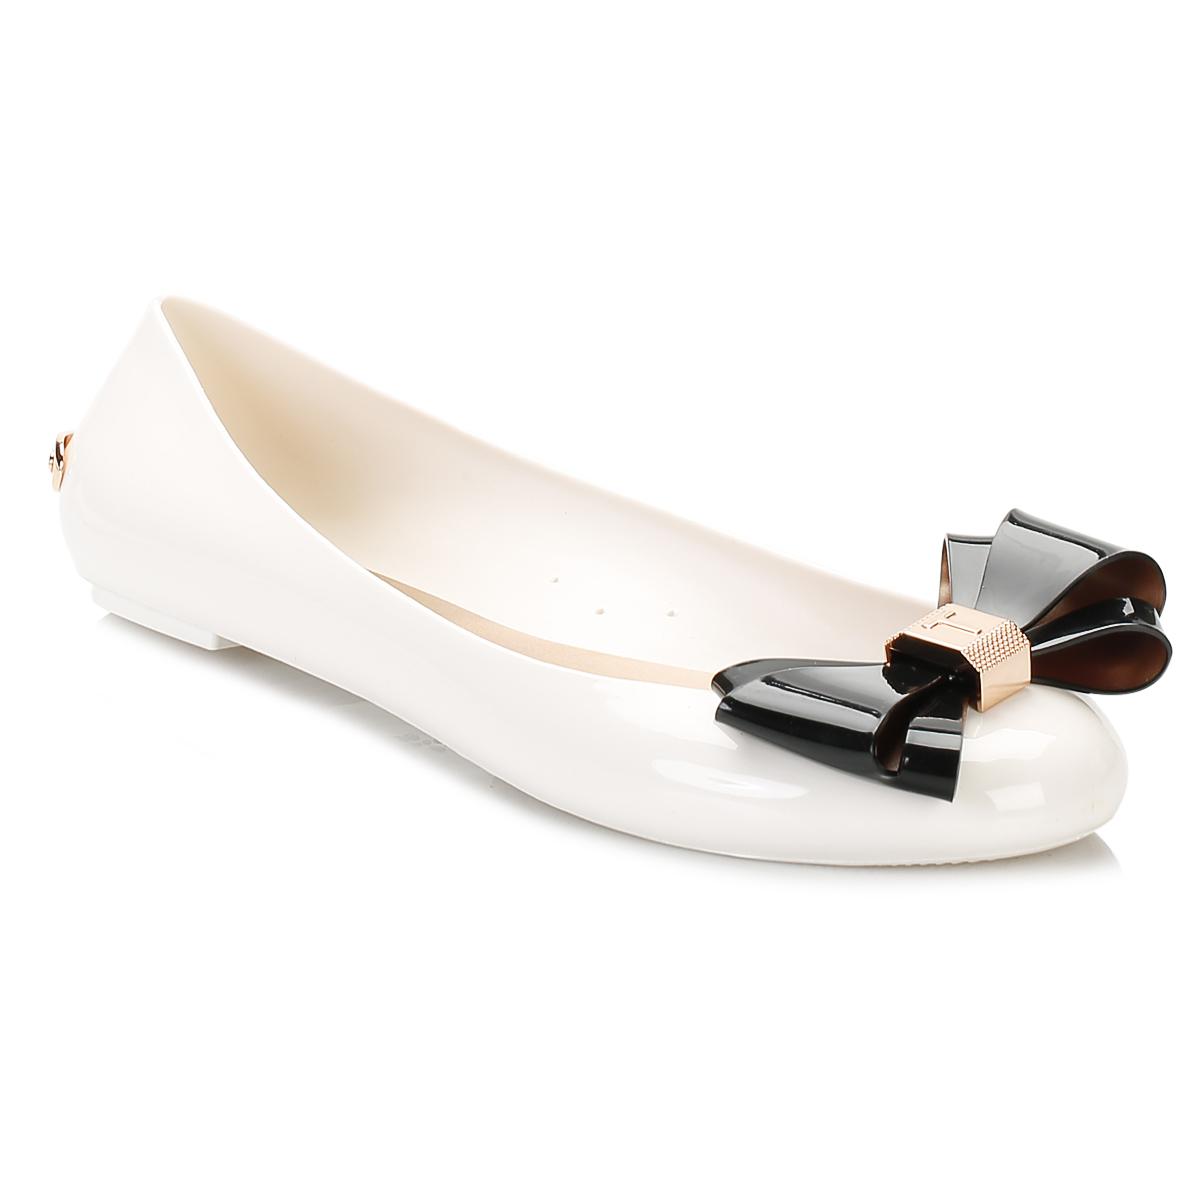 4f0f45e6dfb22 Ted Baker Womens White Julivia Ballerina Flats